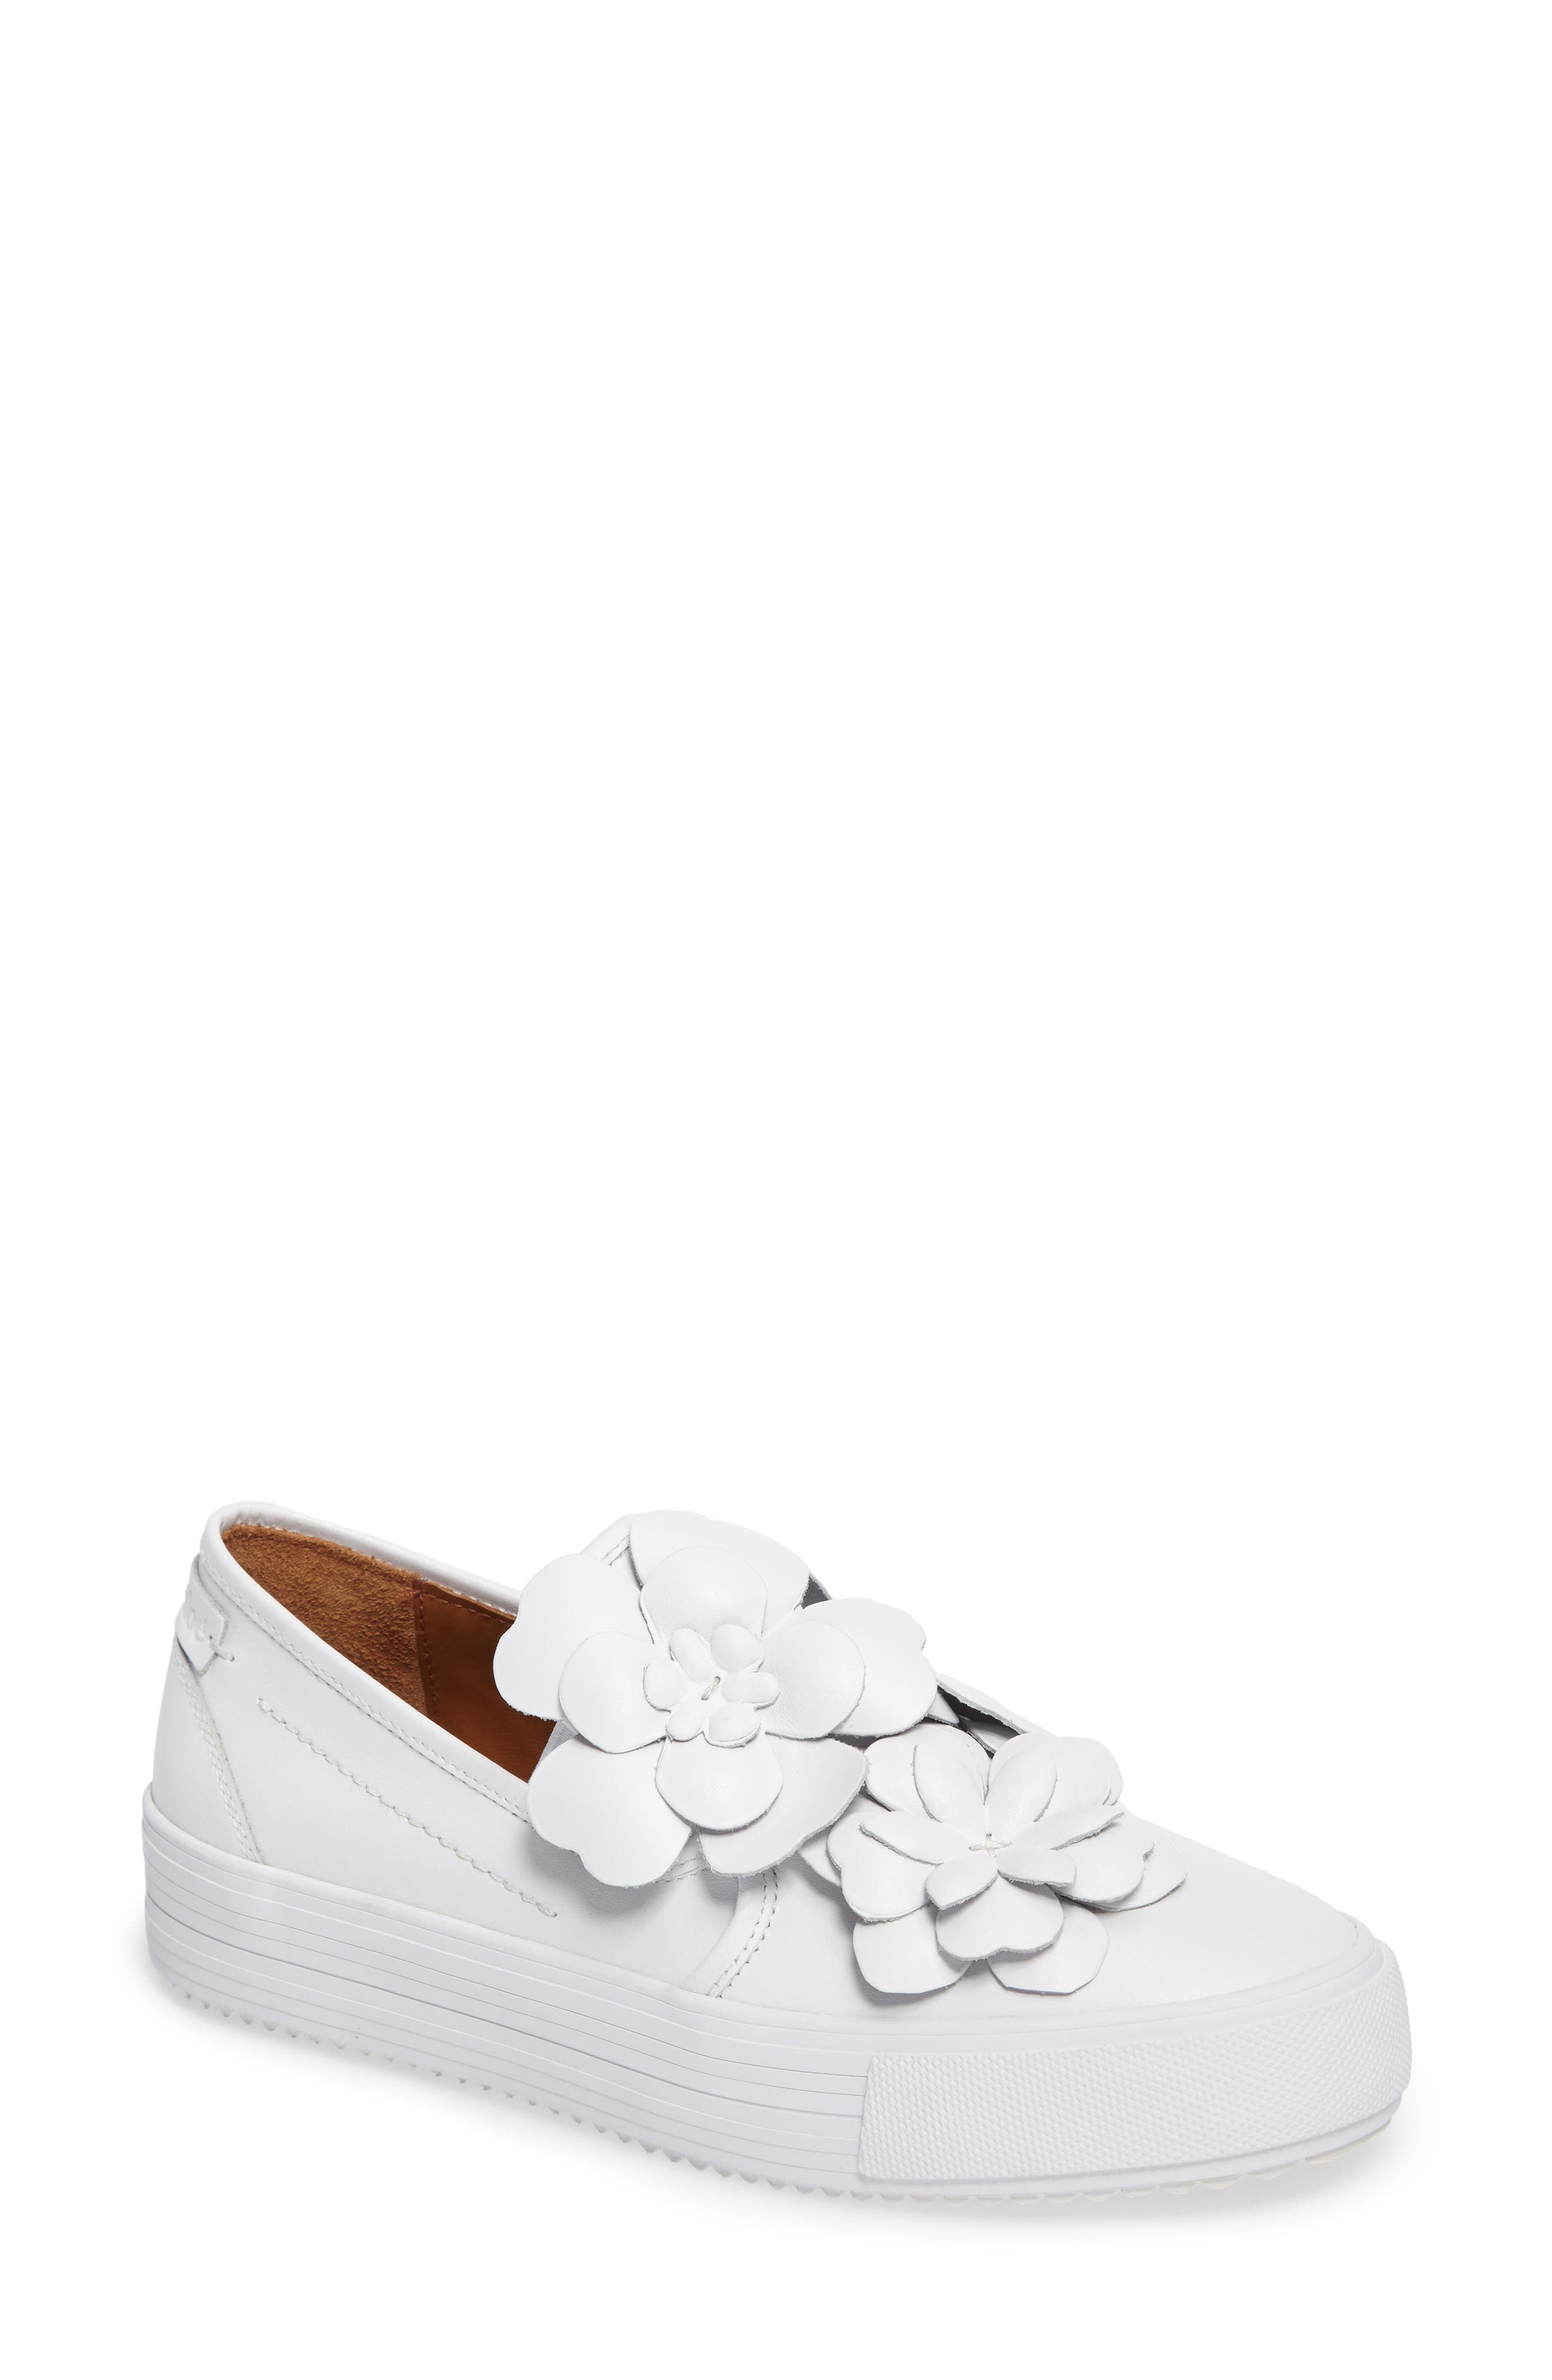 Alternate Image 1 Selected - See by Chloé Vera Floral Appliqué Slip-On Sneaker (Women)